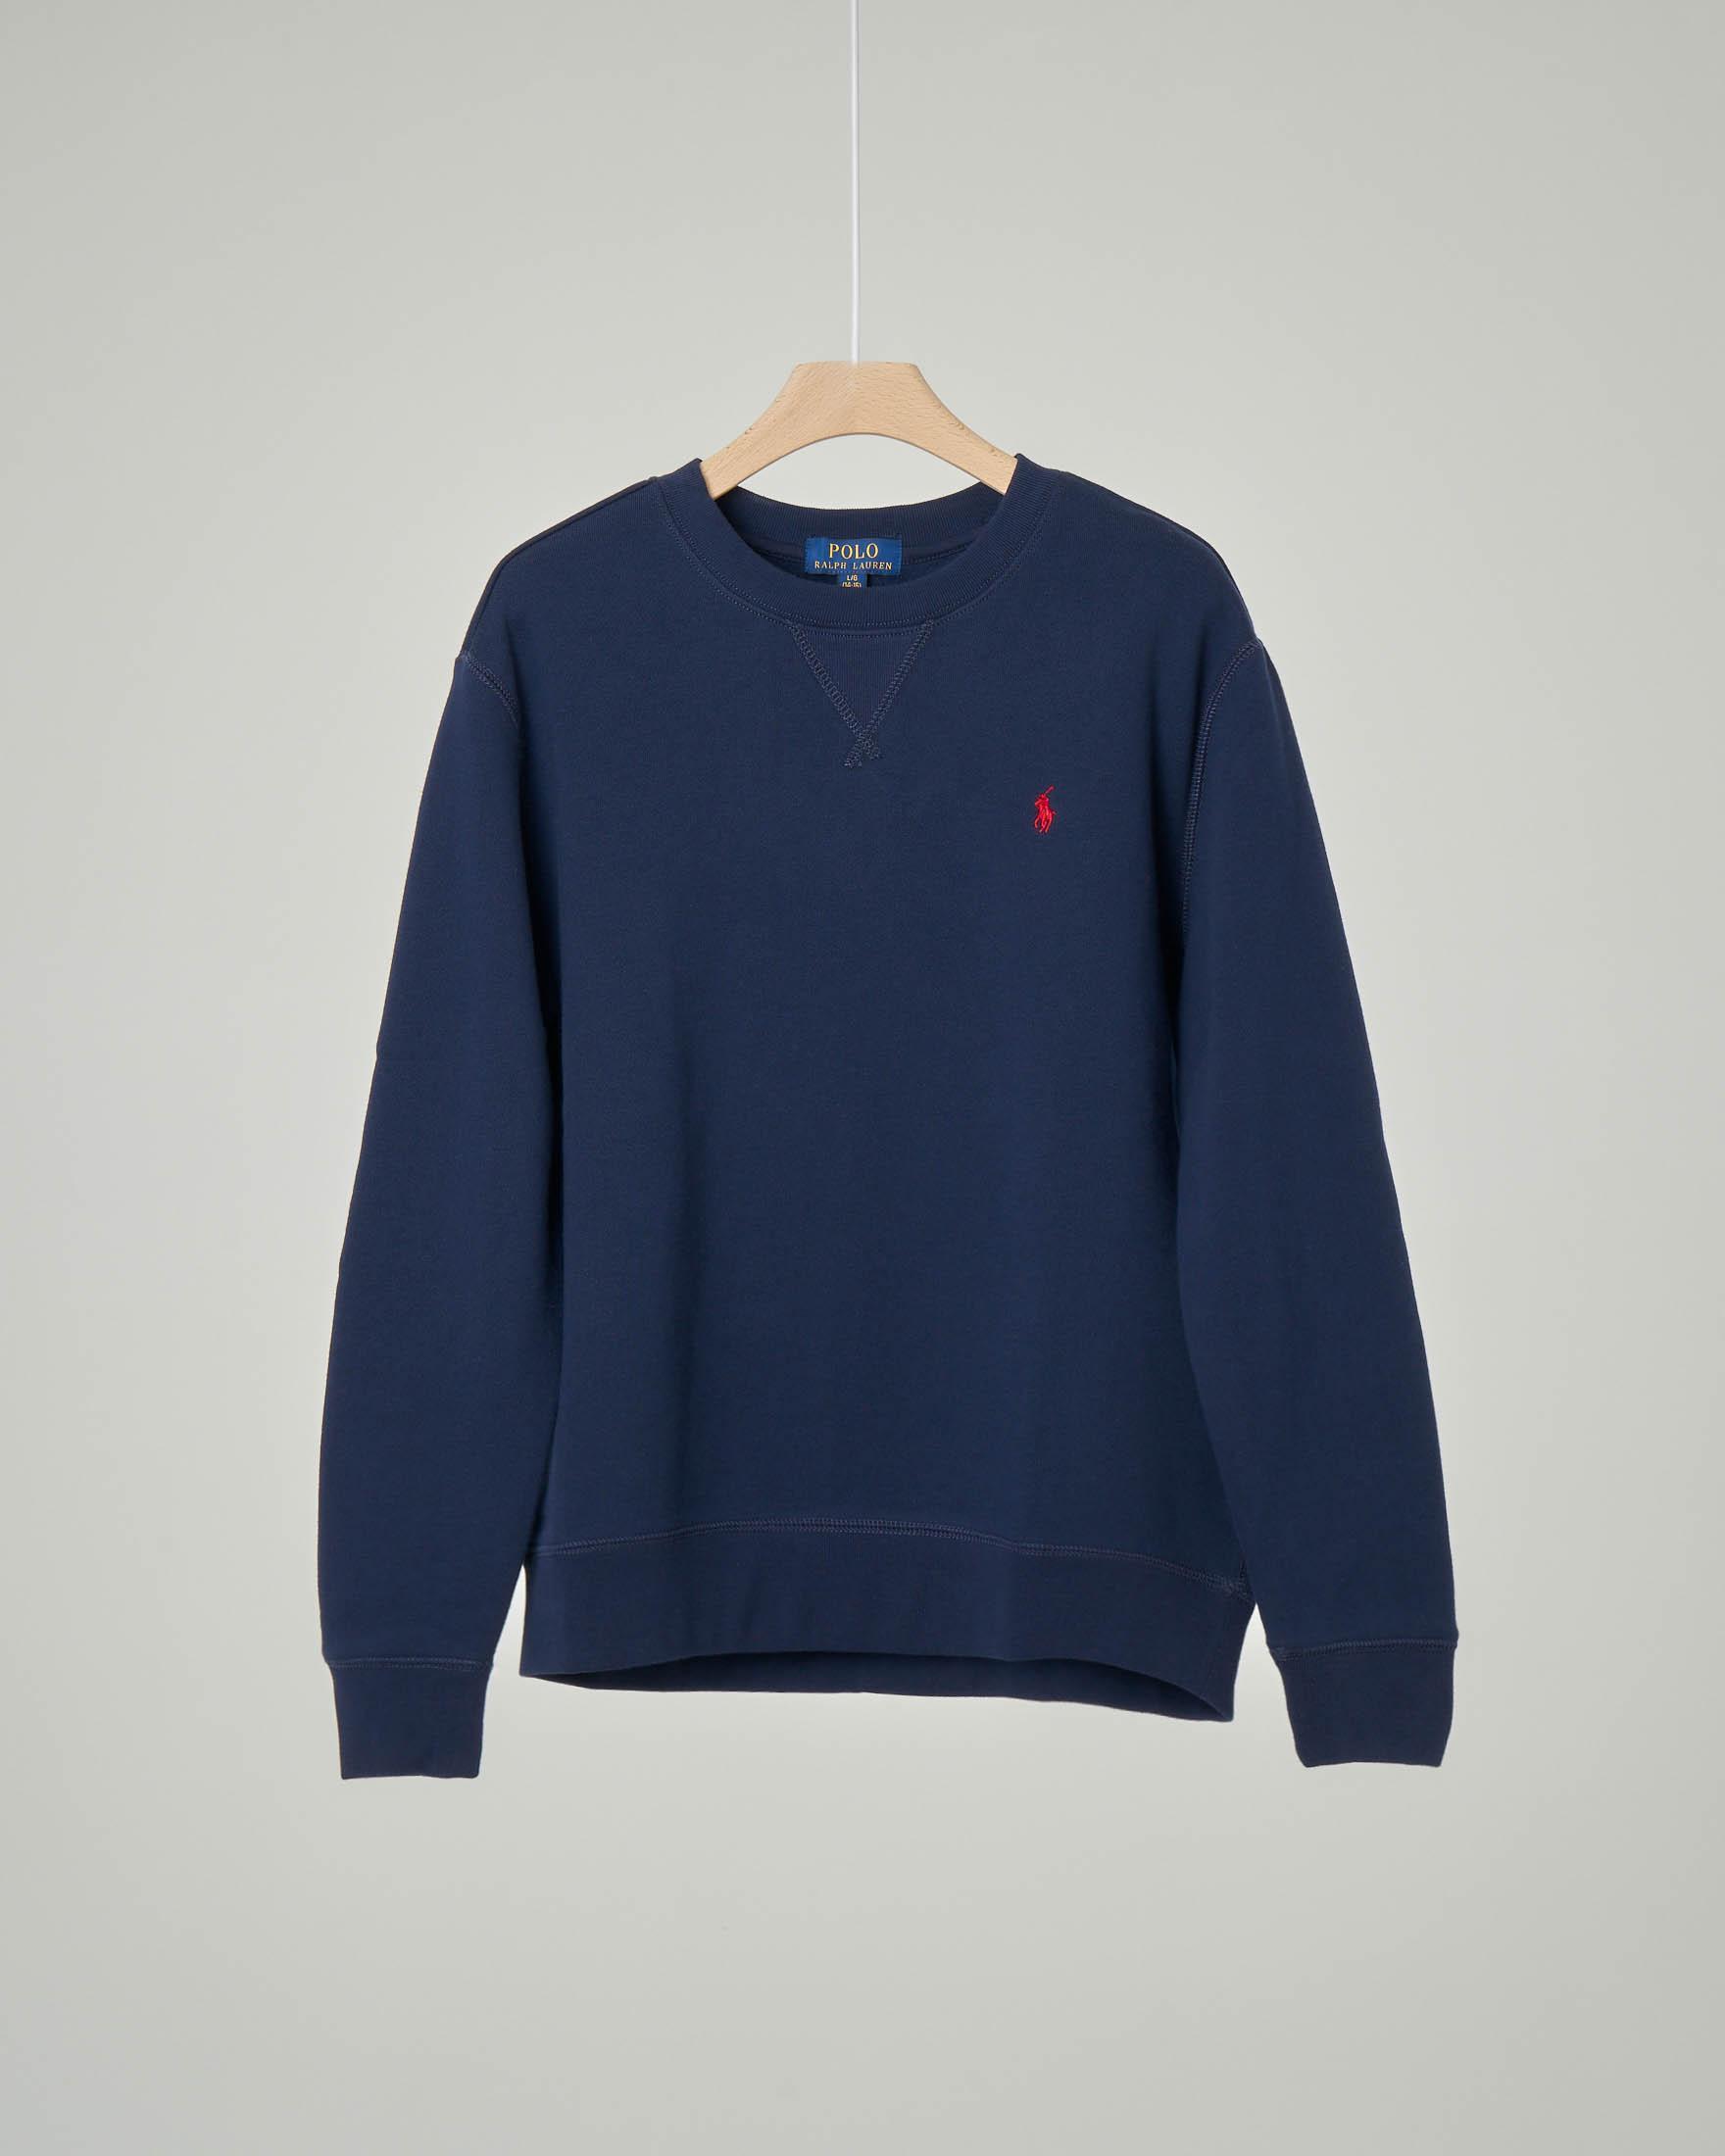 Felpa blu girocollo con logo pony rosso ricamato S-XL